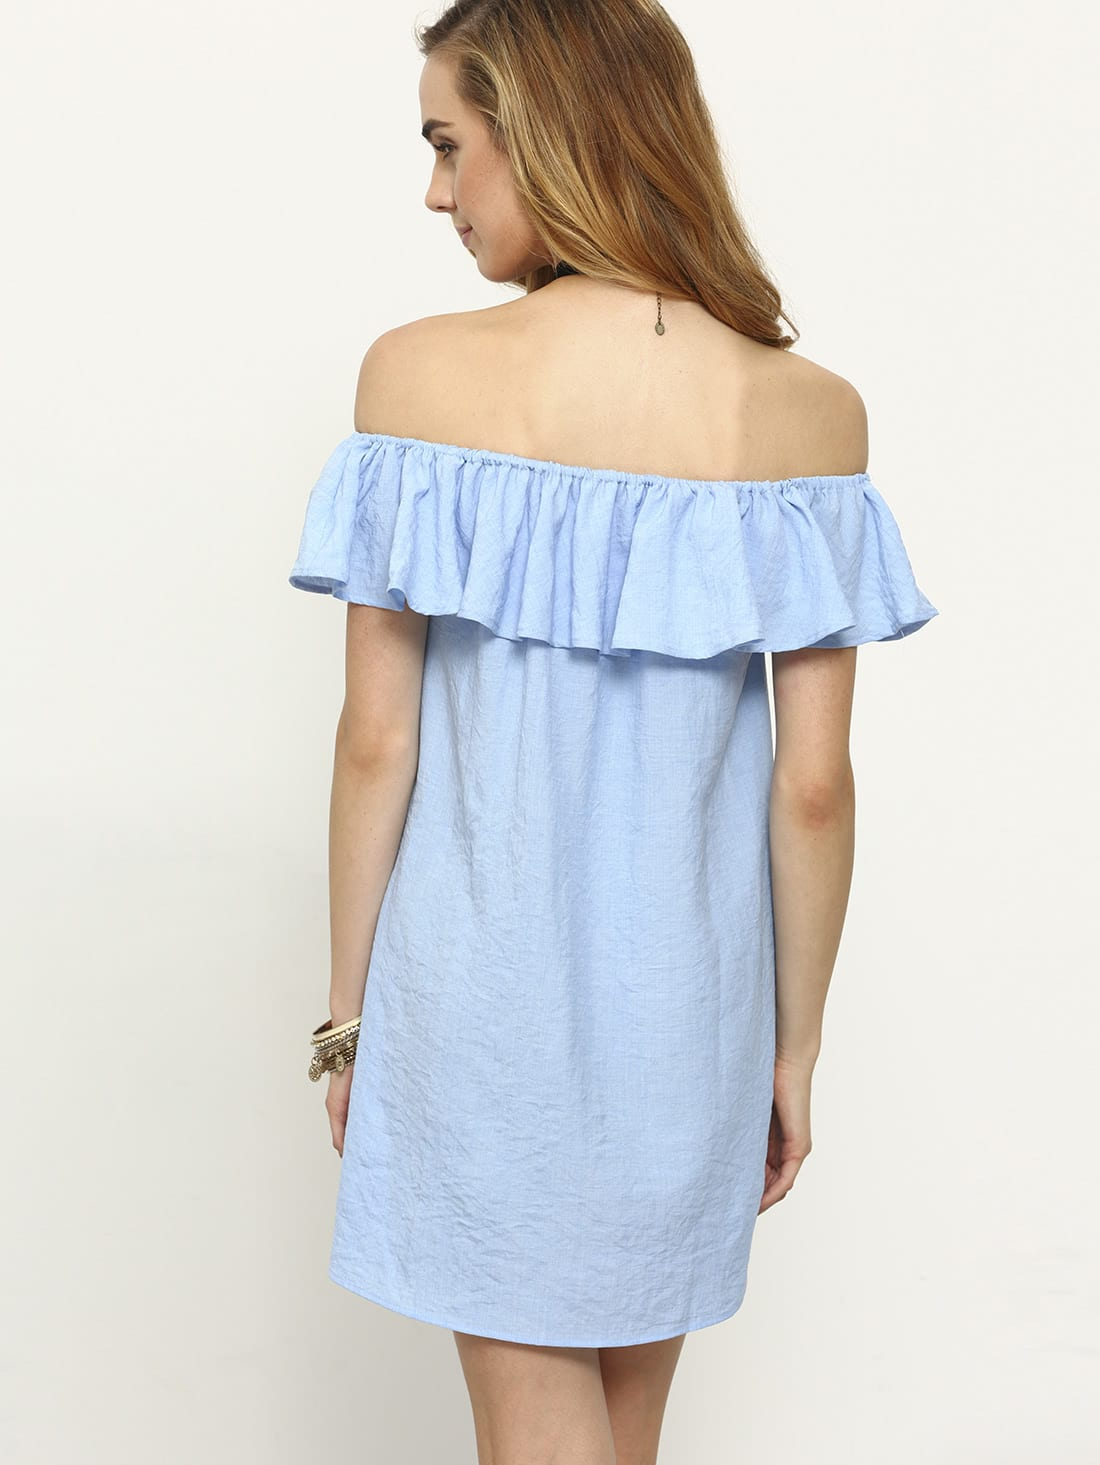 Flounce Off-The-Shoulder Dress - Blue